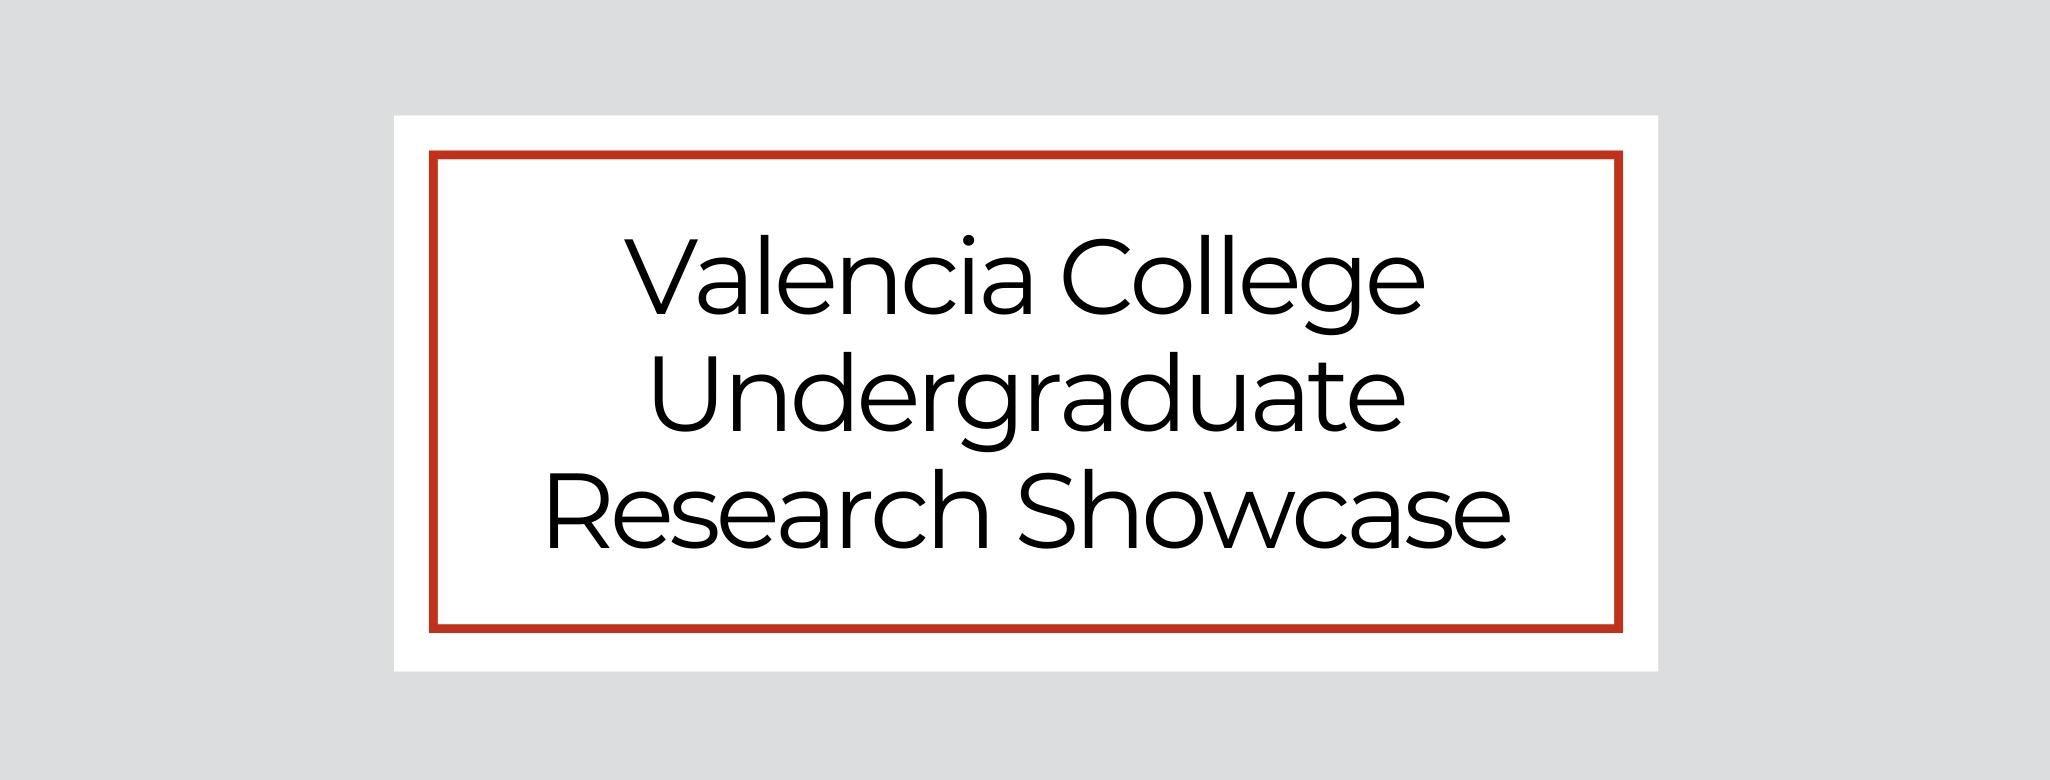 Valencia College Undergraduate Research Showcase